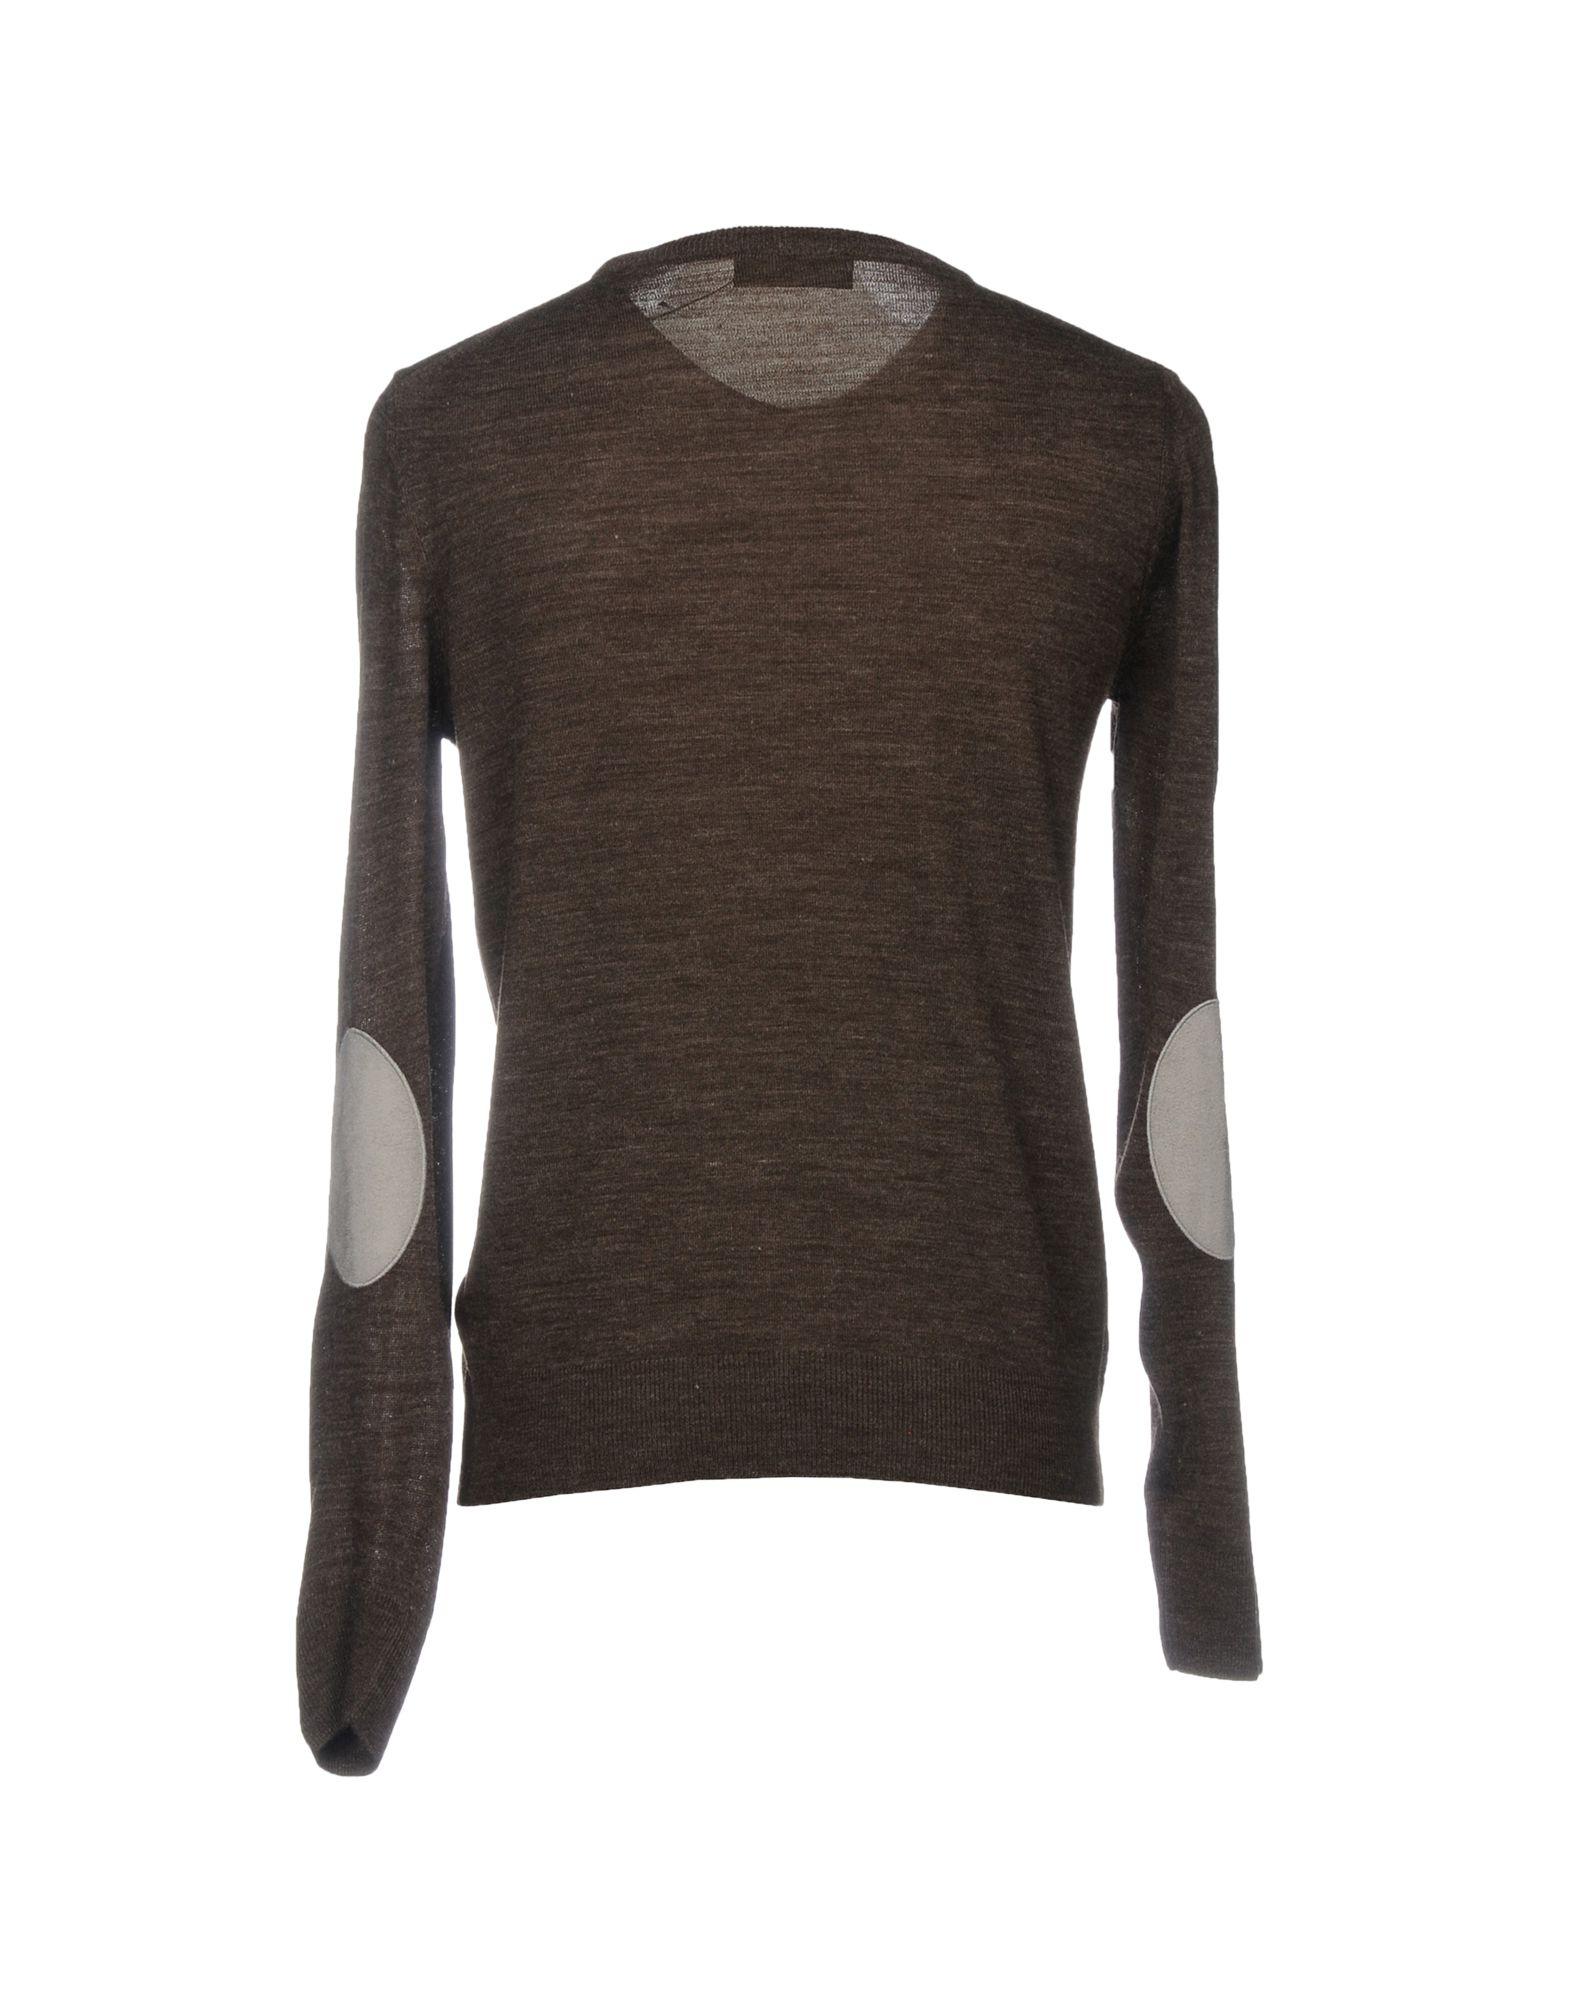 Pullover Pullover Pullover Frosso Perry Uomo - 39840597CD a81823